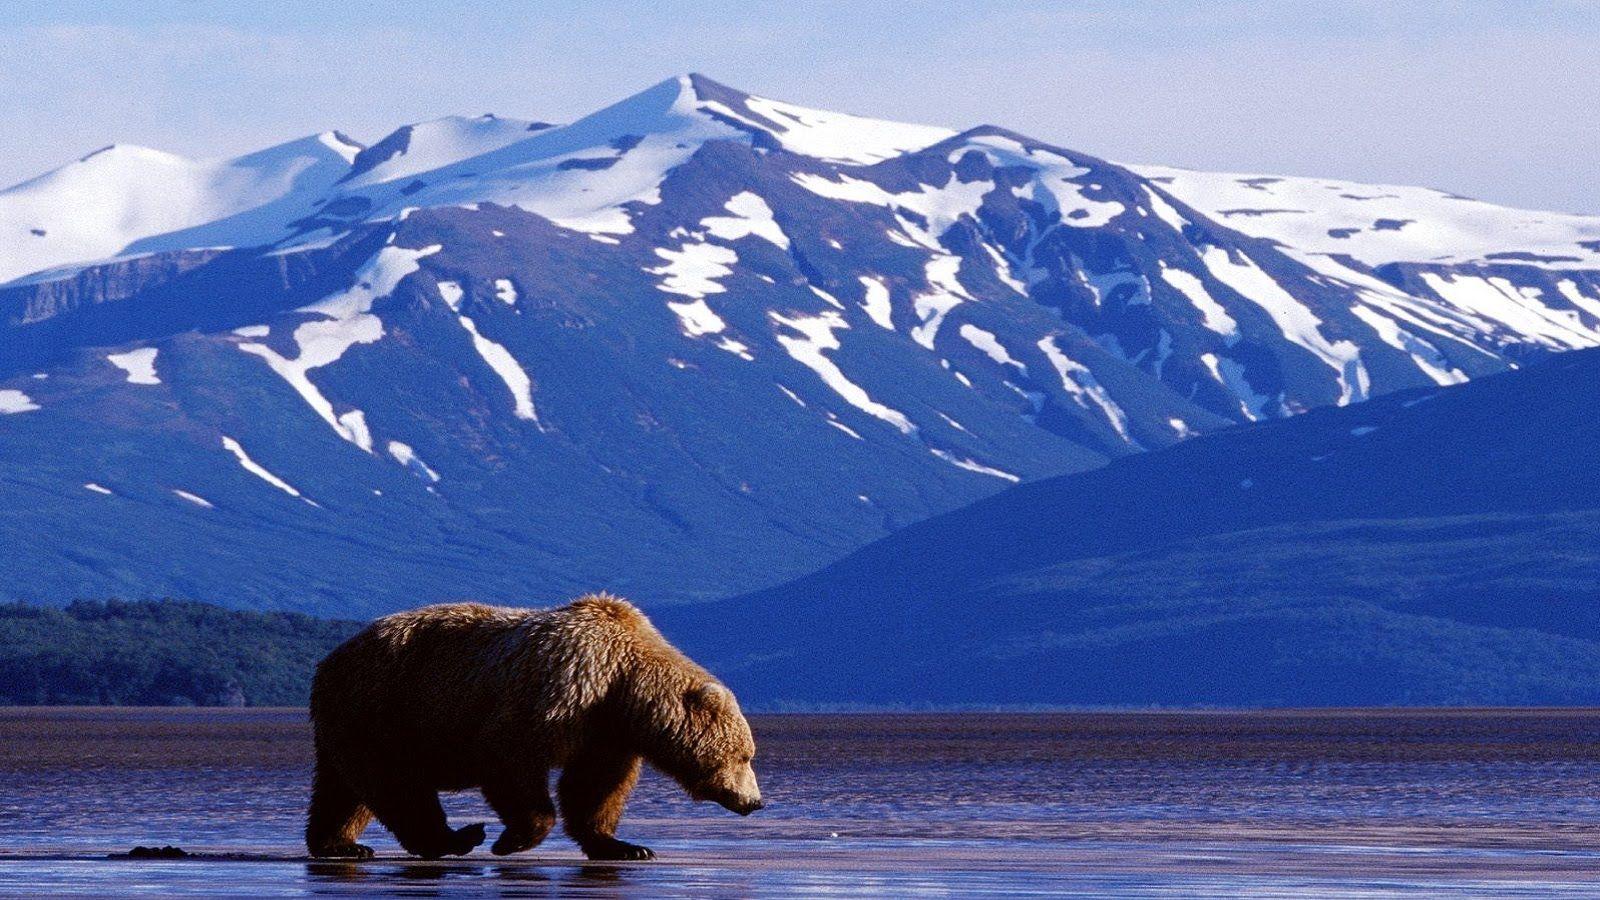 black bear images free